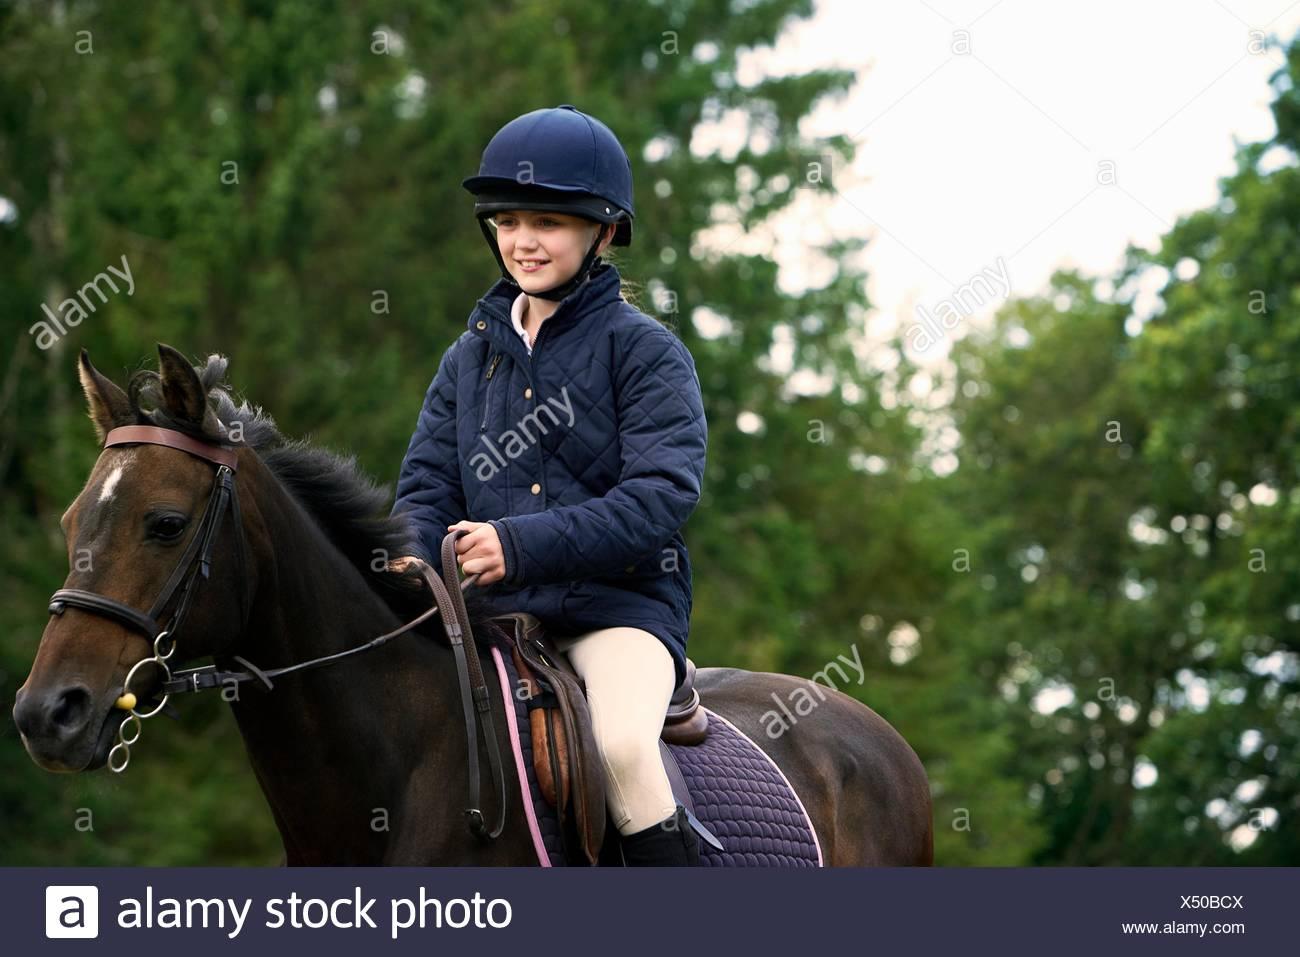 Girl horseback riding in countryside - Stock Image